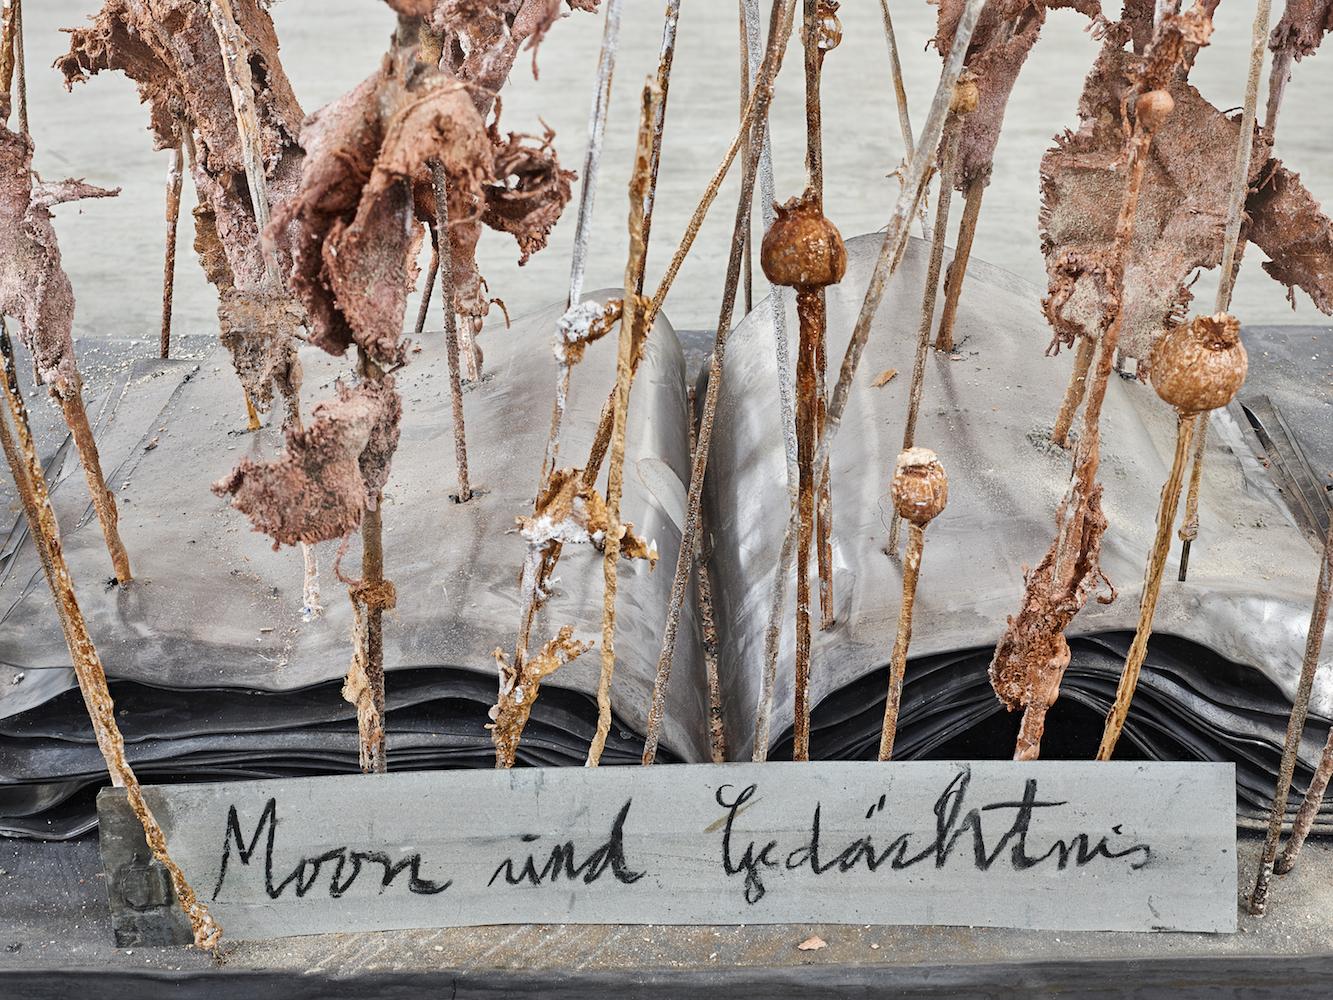 Anselm Kiefer, Opus Magnum – Mohn und Gedächtnis, 2014, Kiefer-Sammlung Grothe im Franz Marc Museum © Anselm Kiefer, Foto: collecto.art